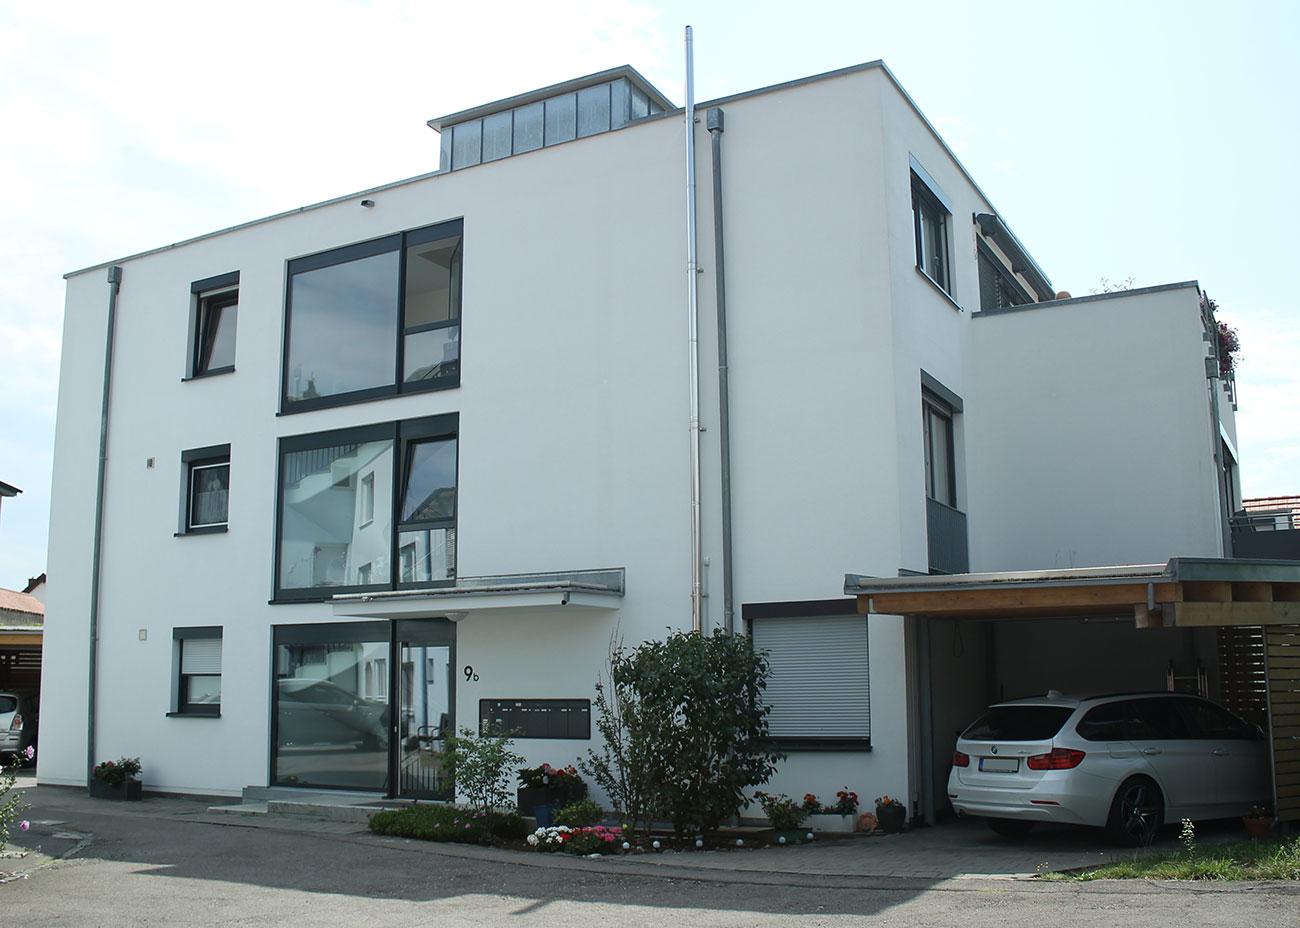 Neubau Mehrfamilienhaus Radolfzeller Straße 9b, Konstanz